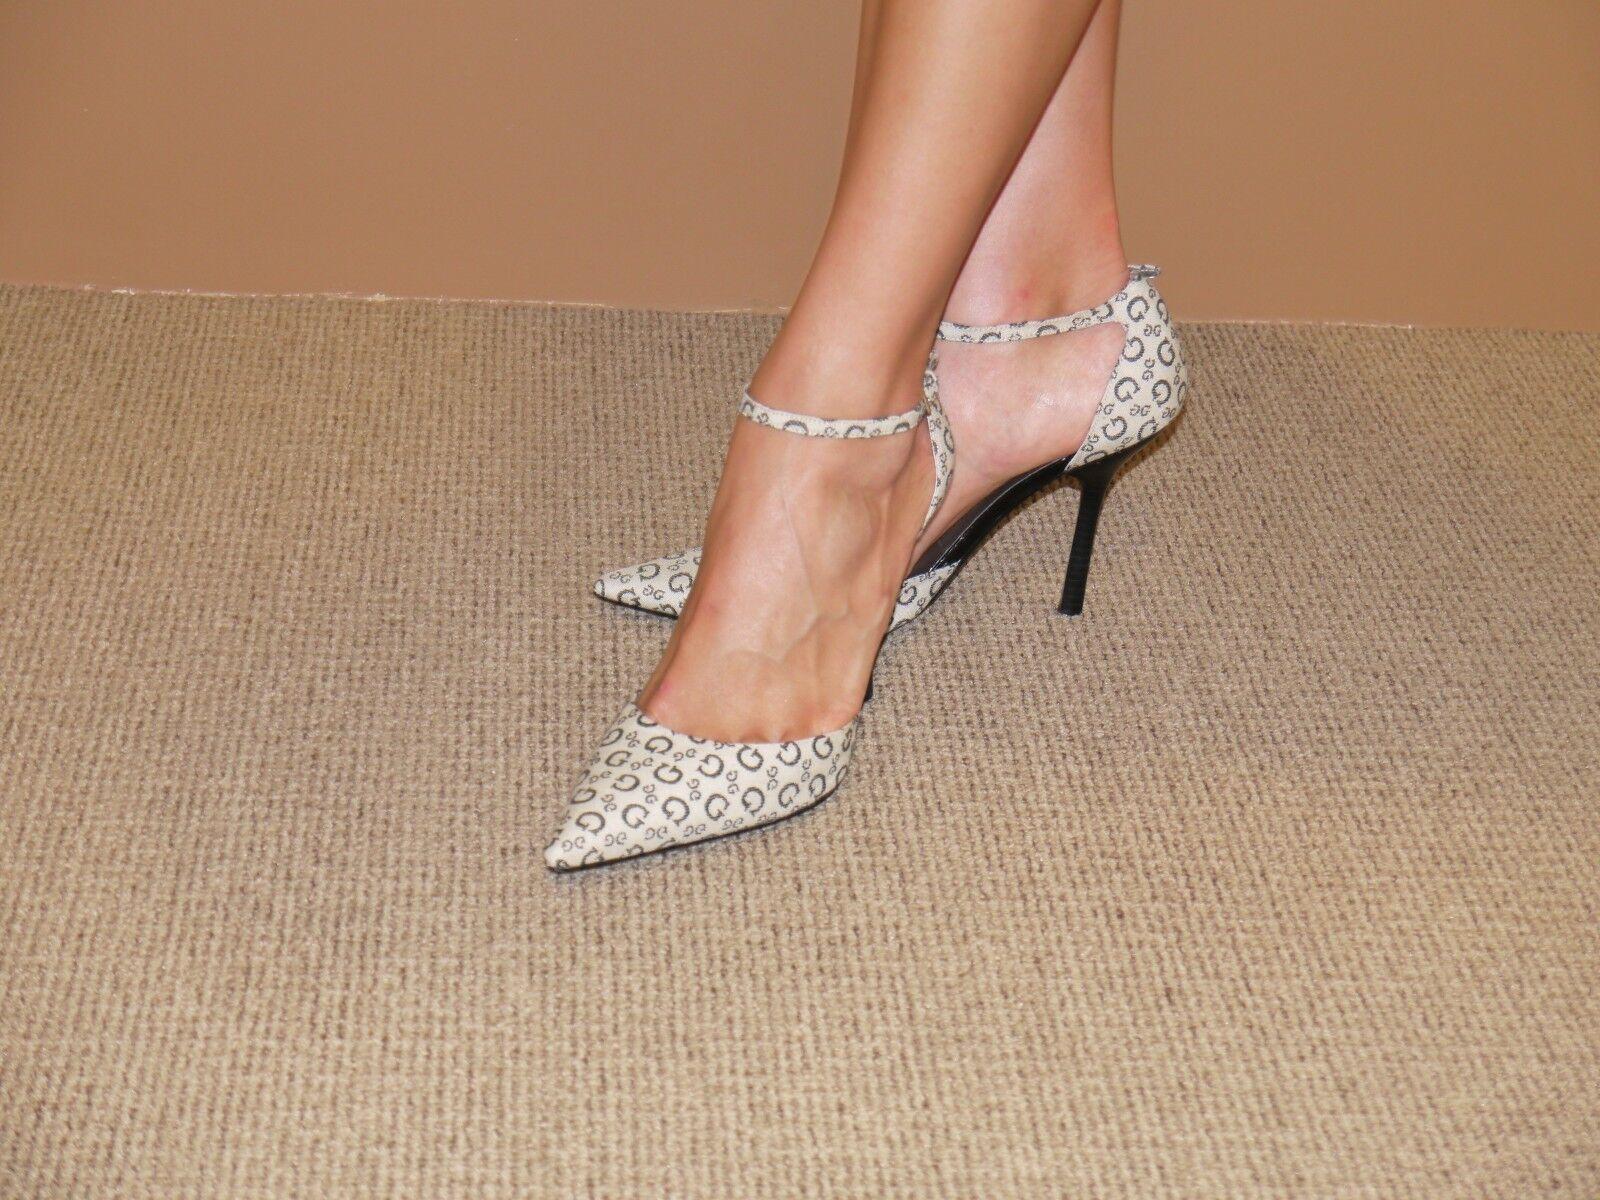 GUESS G LOGO  Pointed toe high heel heel heel pump with ankle strap US 8.5 EUR 38.5 af9f19